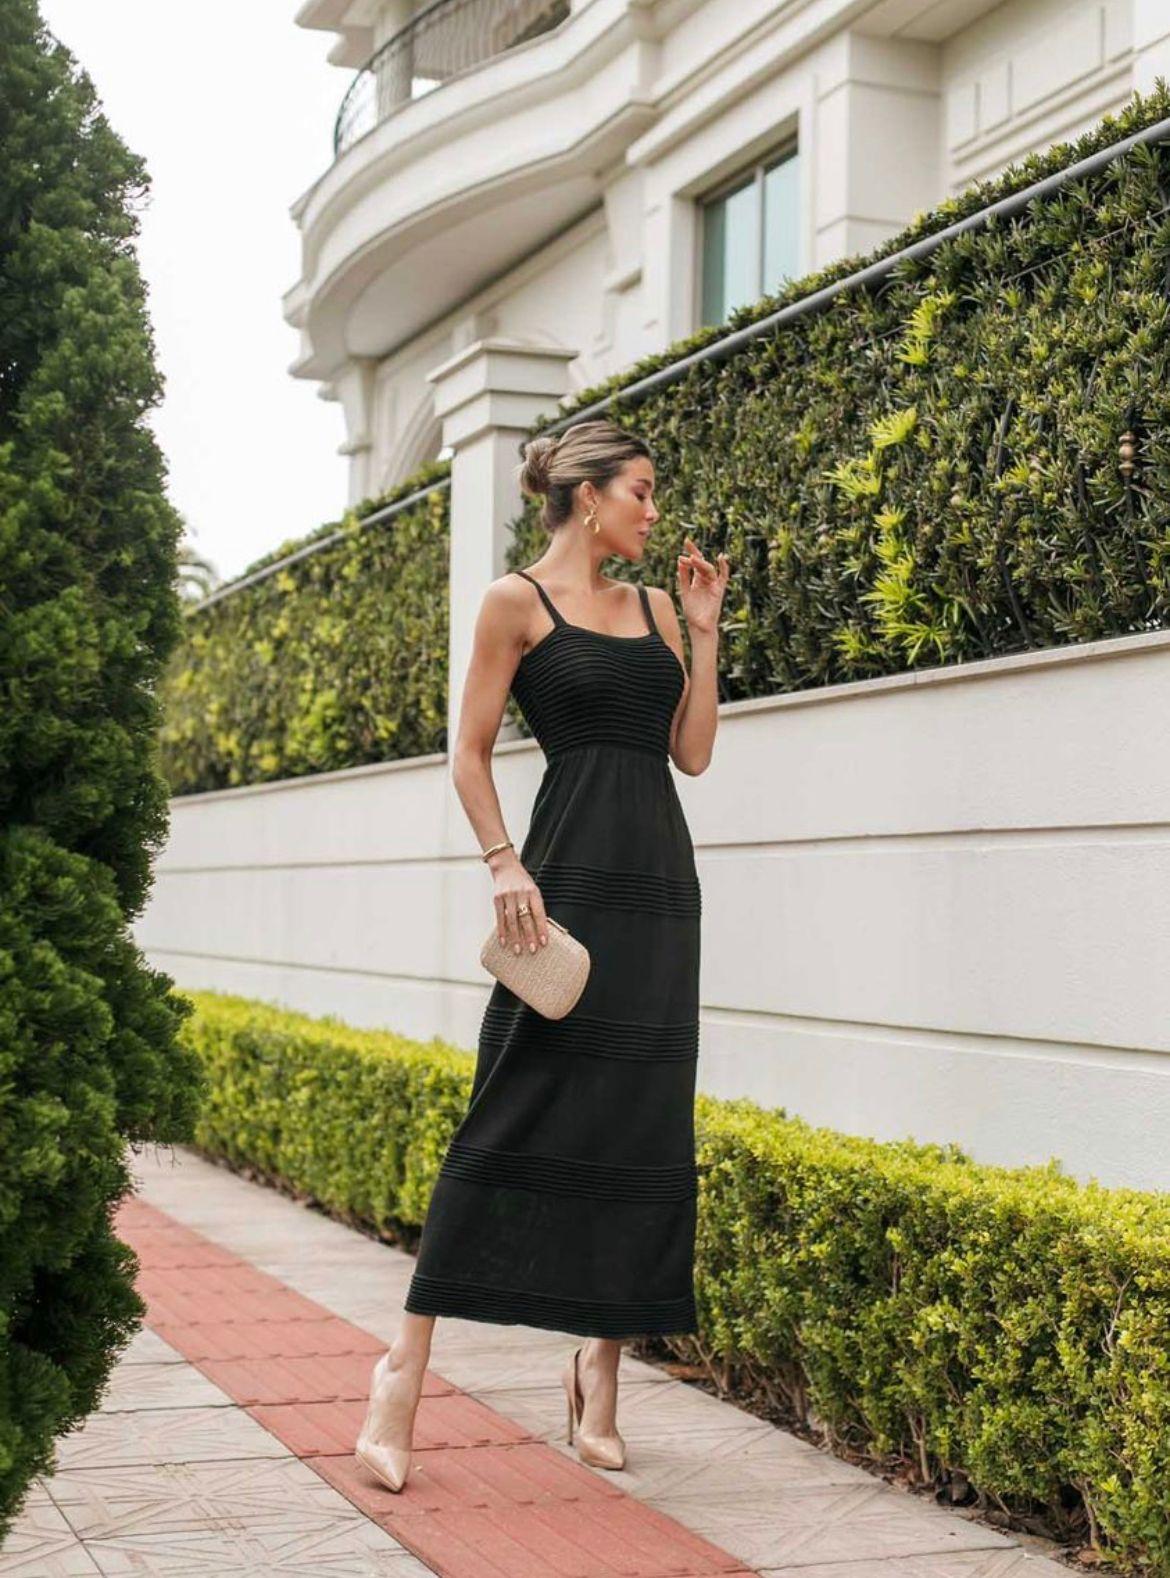 Vestido de Tricot Modal Longo de Alças Preto